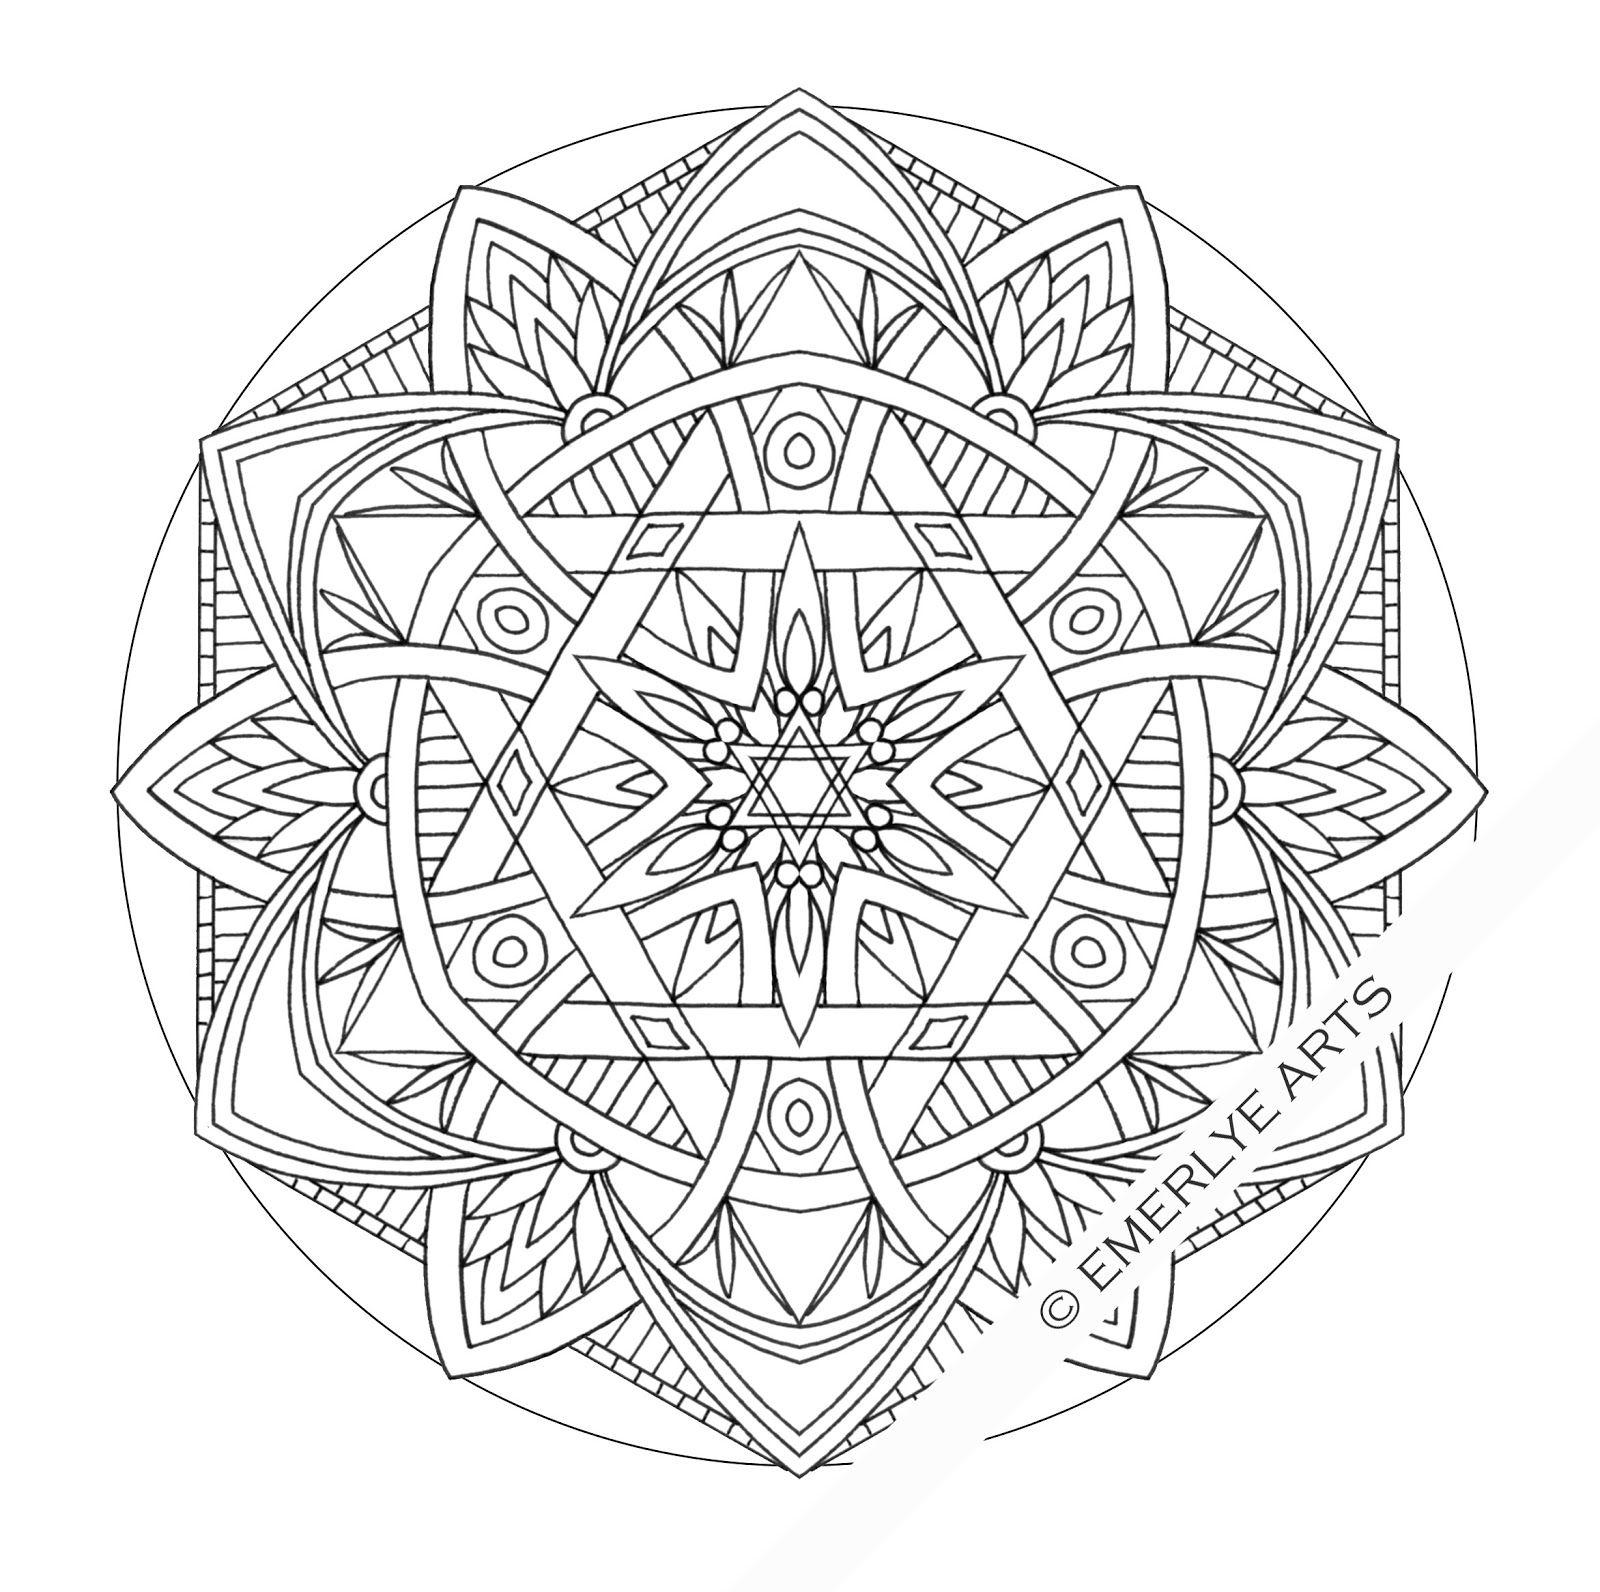 1600x1592 Printable Cynthia Emerlye Vermont Artist And Kirigami Papercutter